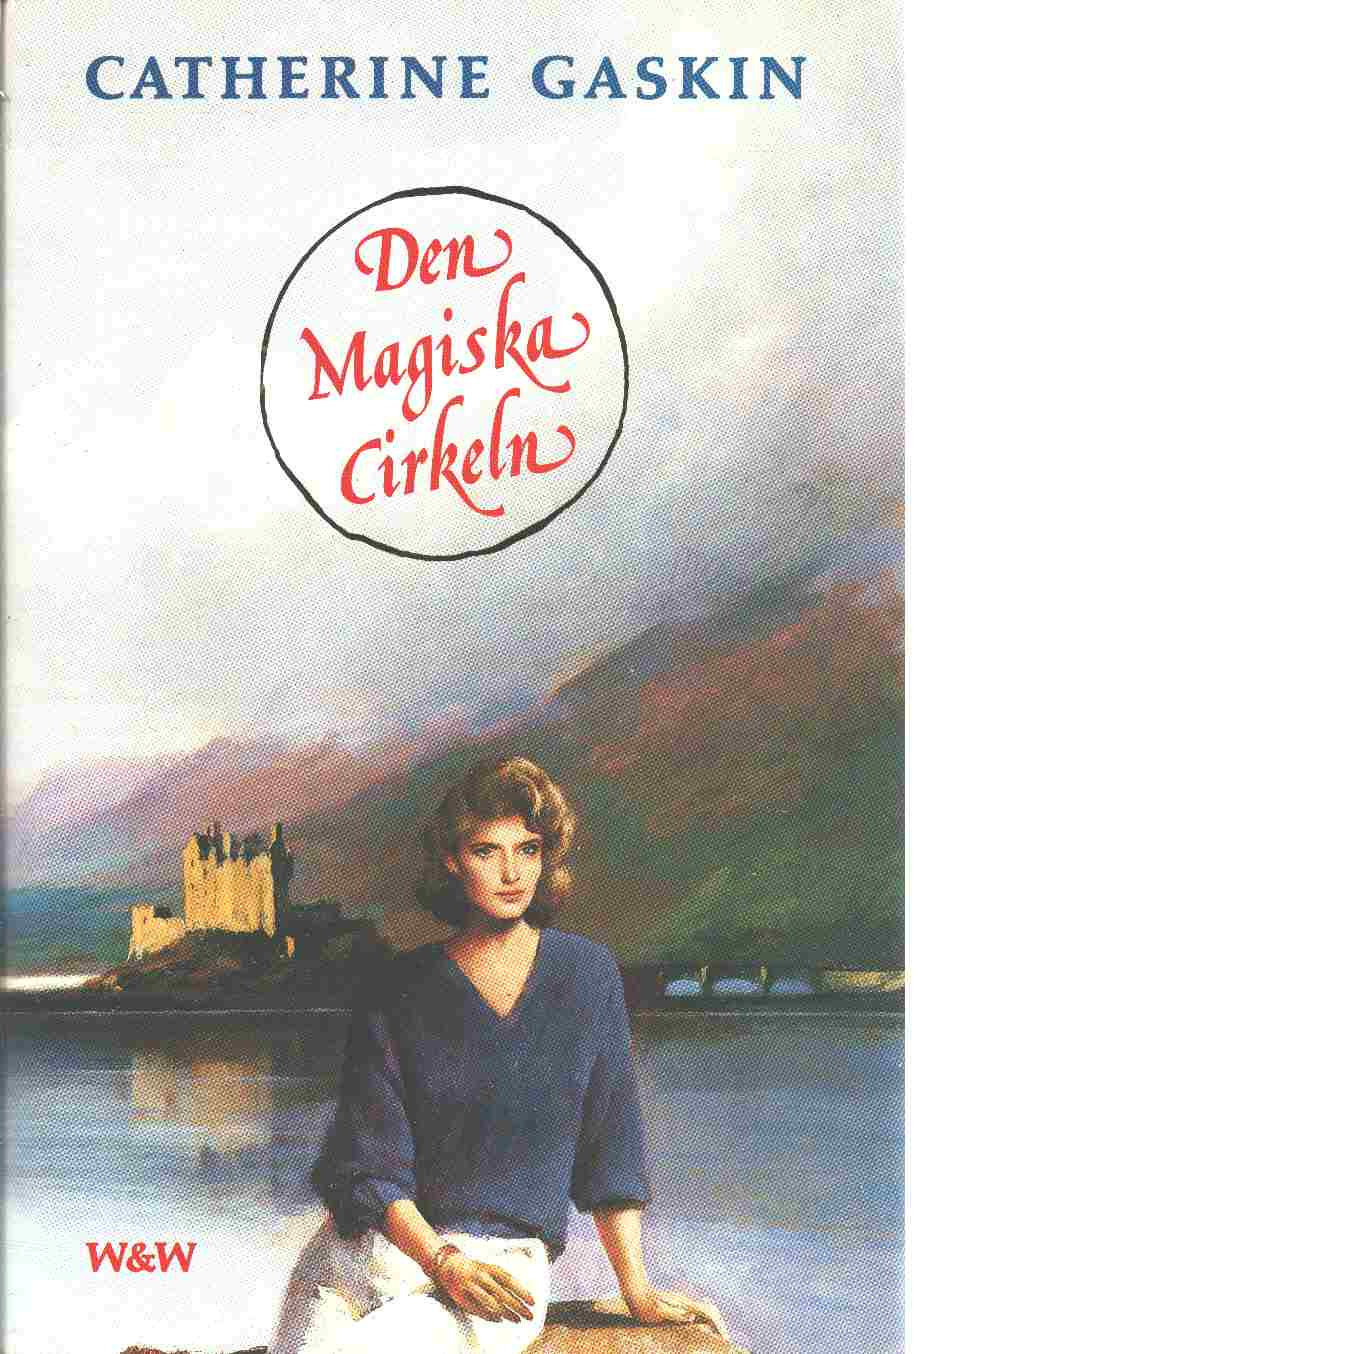 Den magiska cirkeln - Gaskin, Catherine